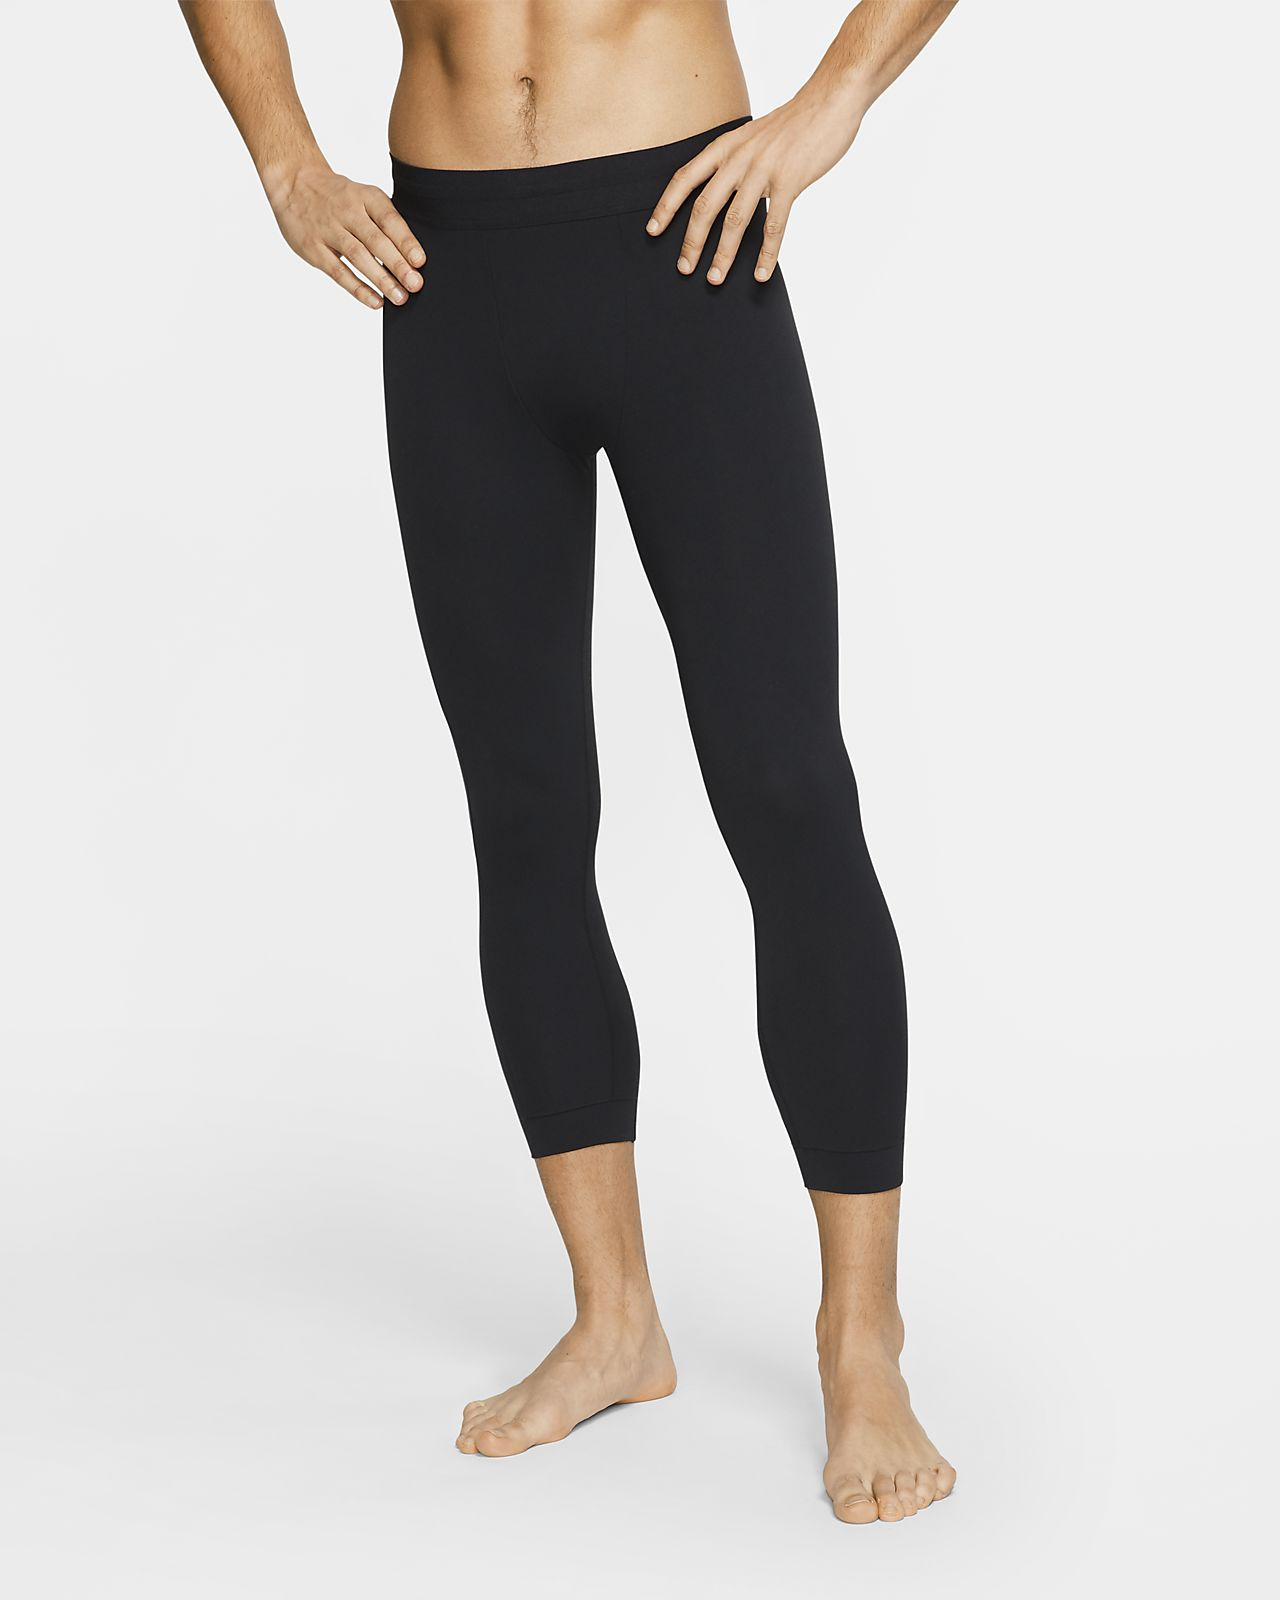 Damen Mädchen Fitness Hose Leggings 3//4 Länge Fitnessstudio Jogging Yoga